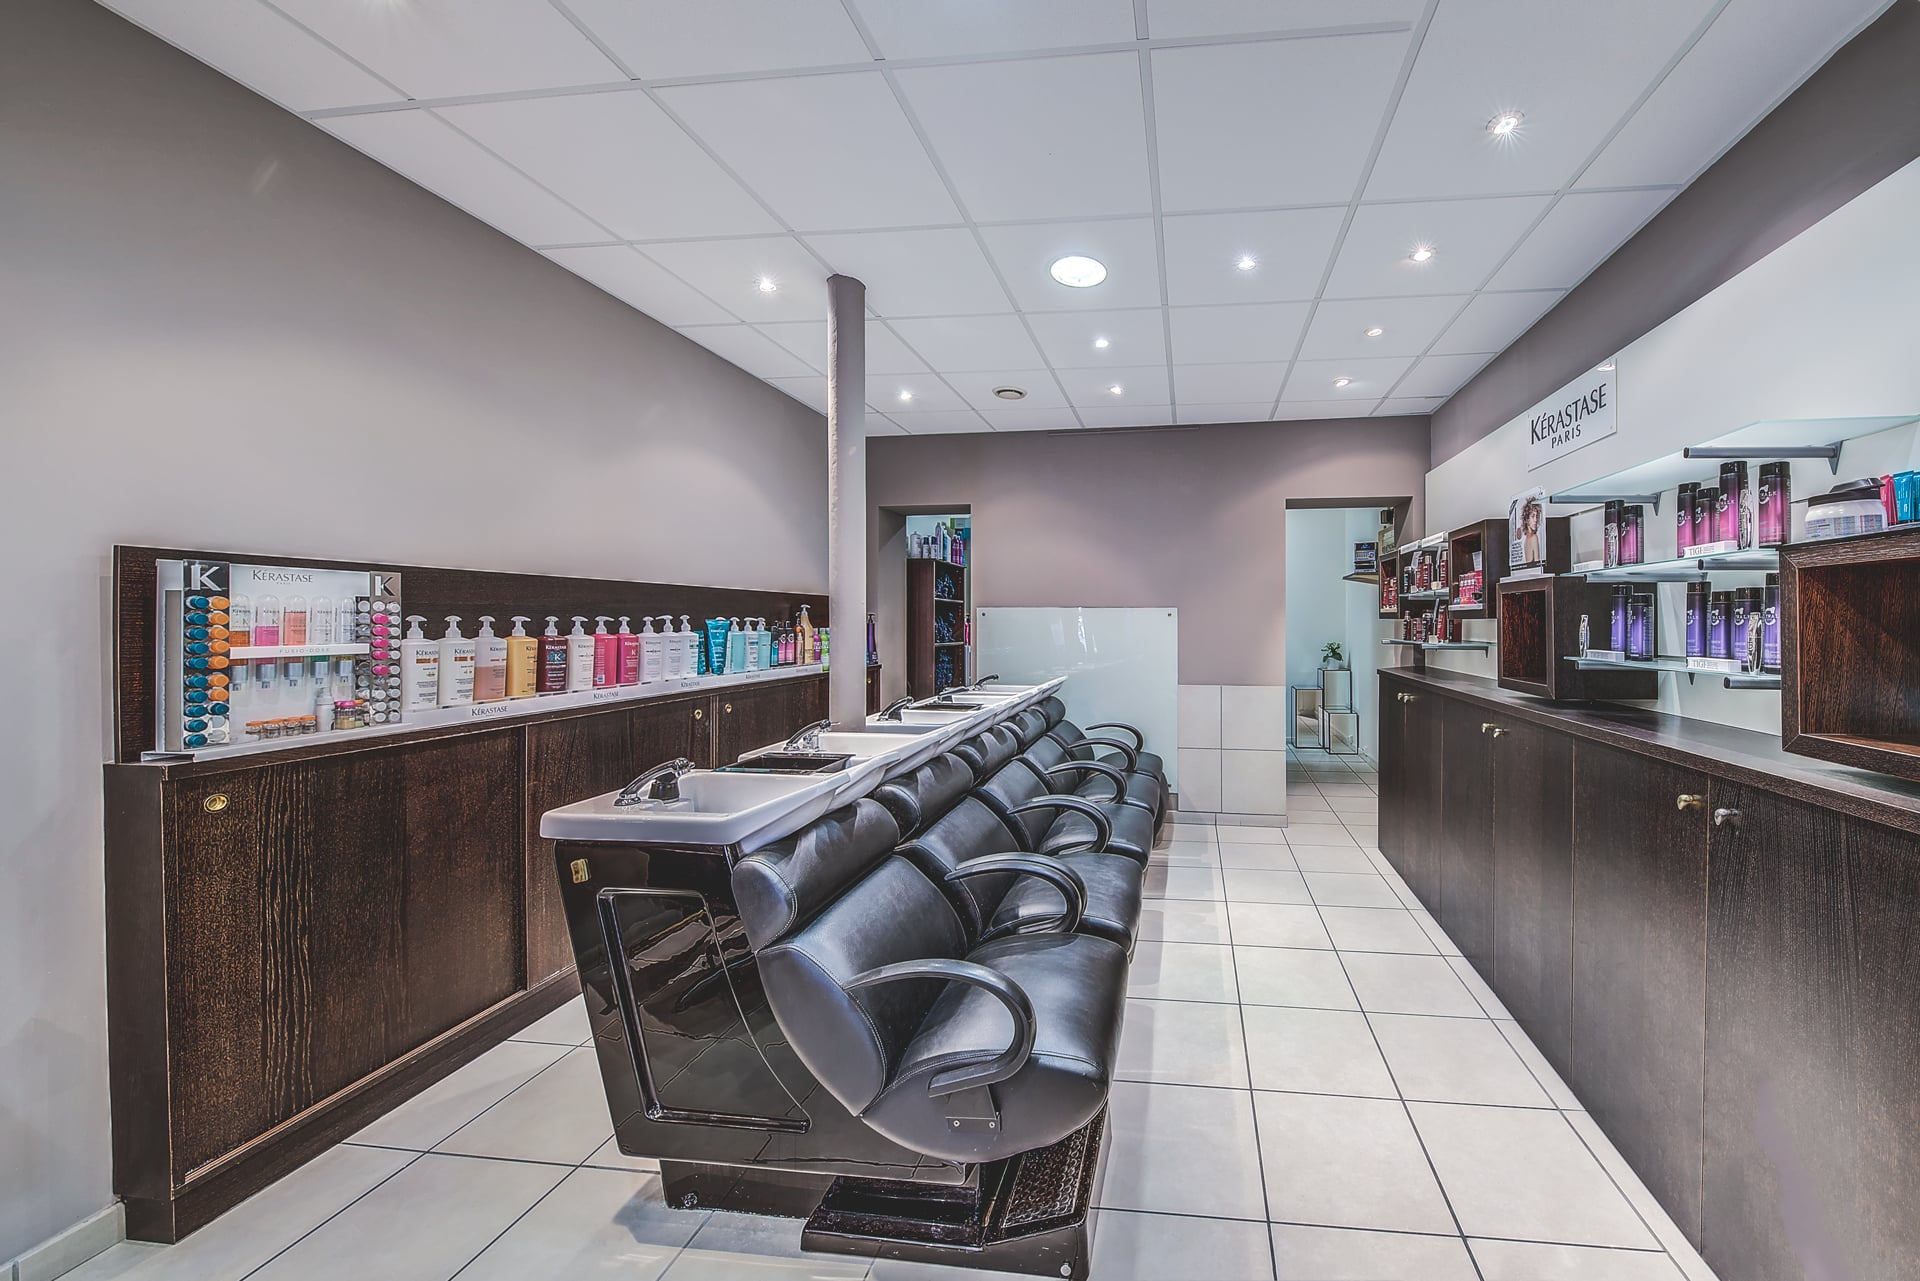 salon de coiffure l'oreal Reims